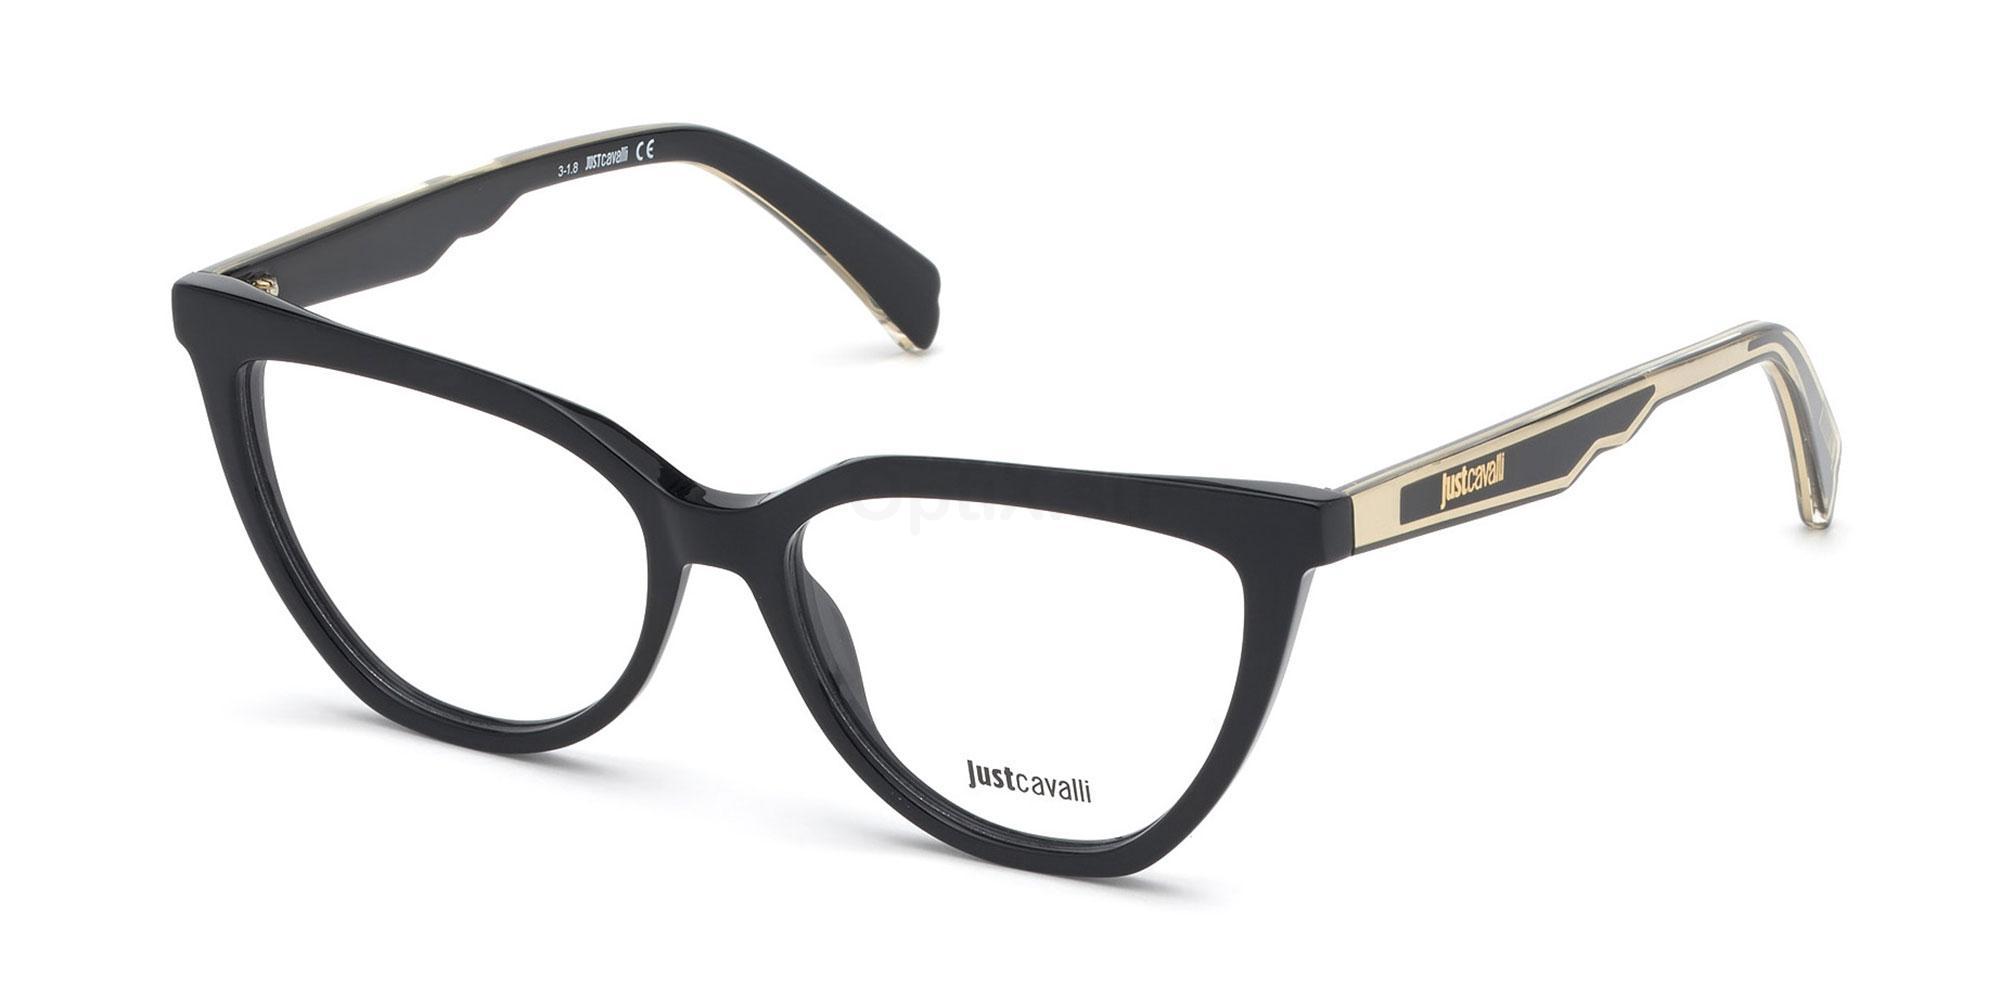 001 JC0877 Glasses, Just Cavalli